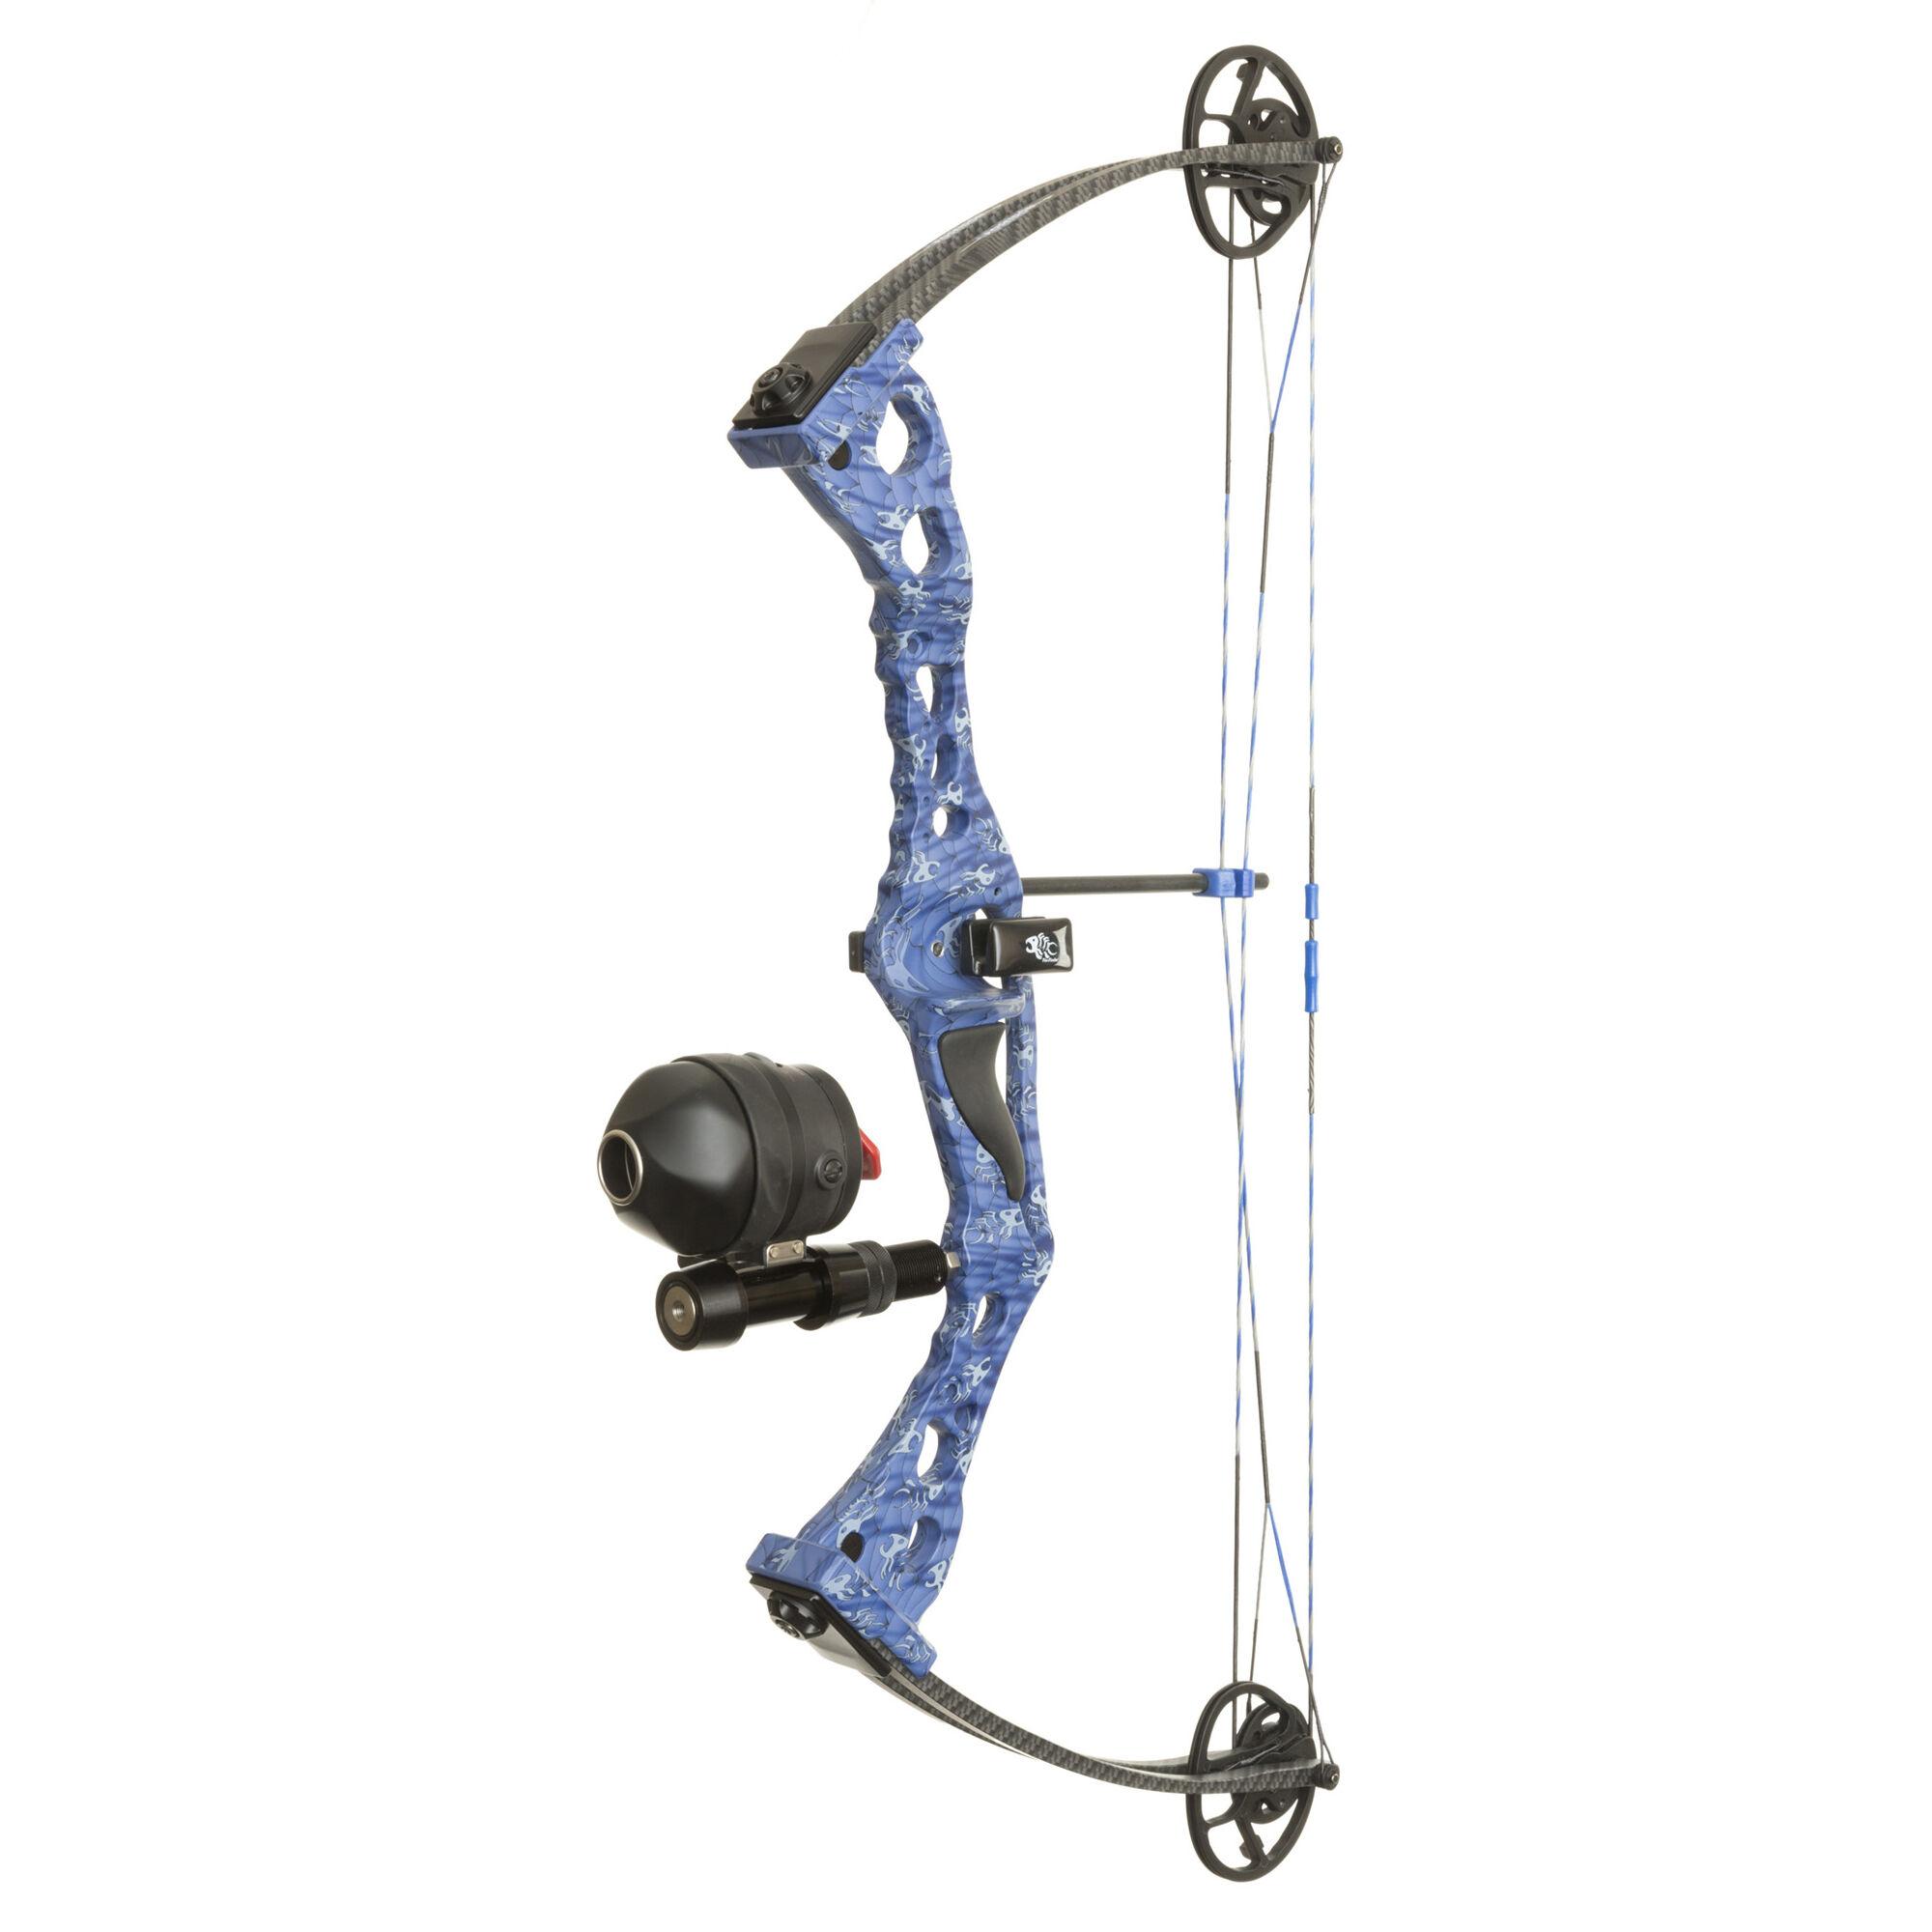 40lb Bowfishing Fishing Reel Takedown Recurve Bow Hunting Fish Target Arrows RH